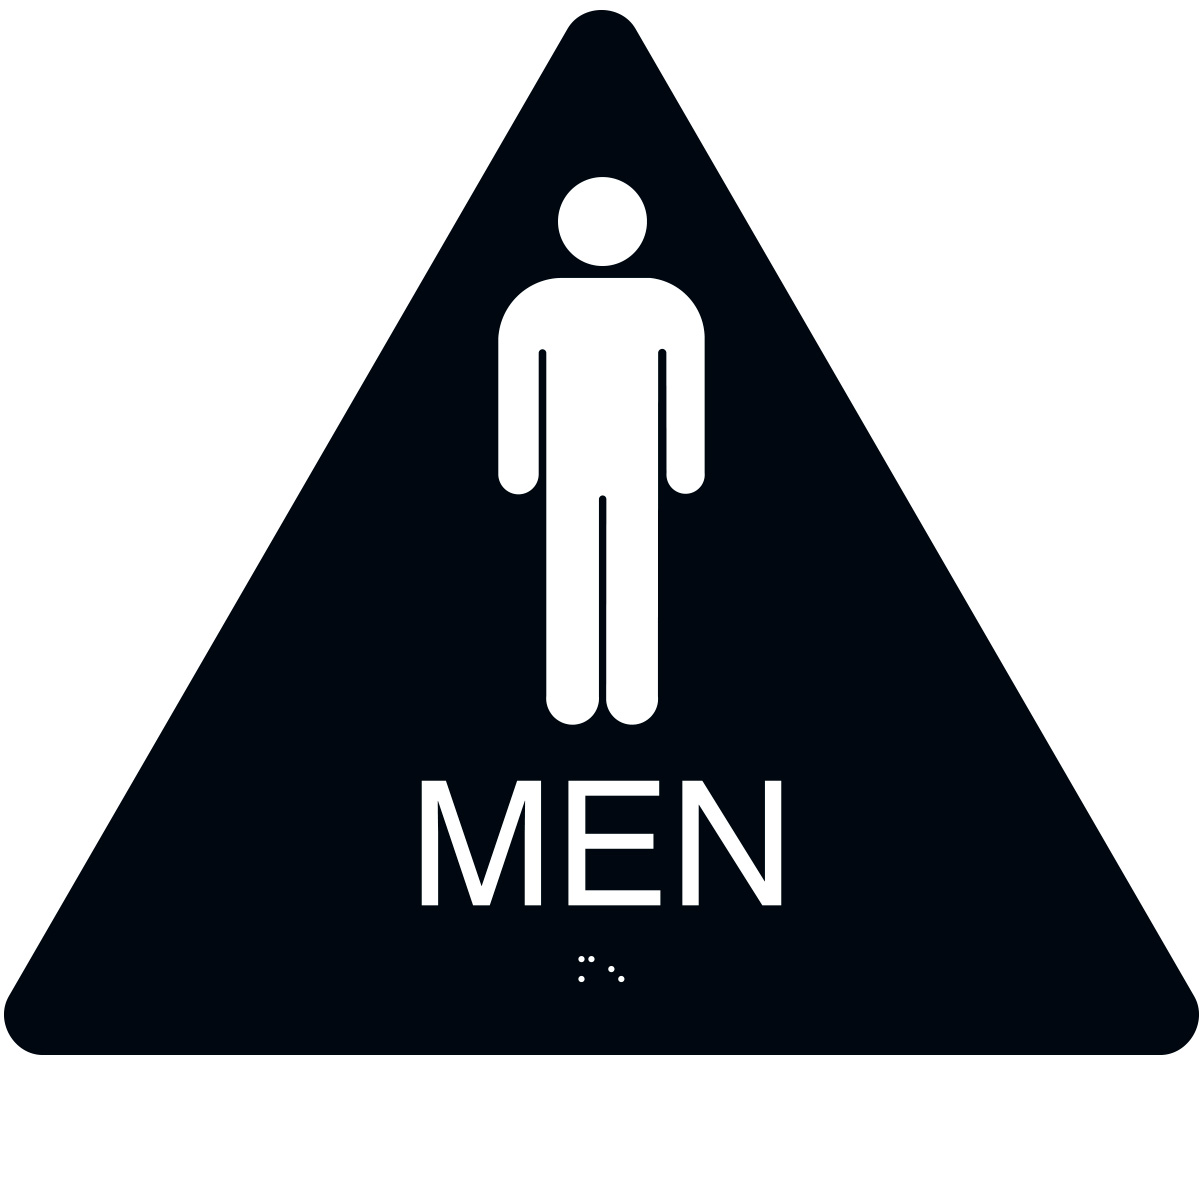 ADA Braille Mens Restroom Triangle Sign Engraved Applique Grade 2